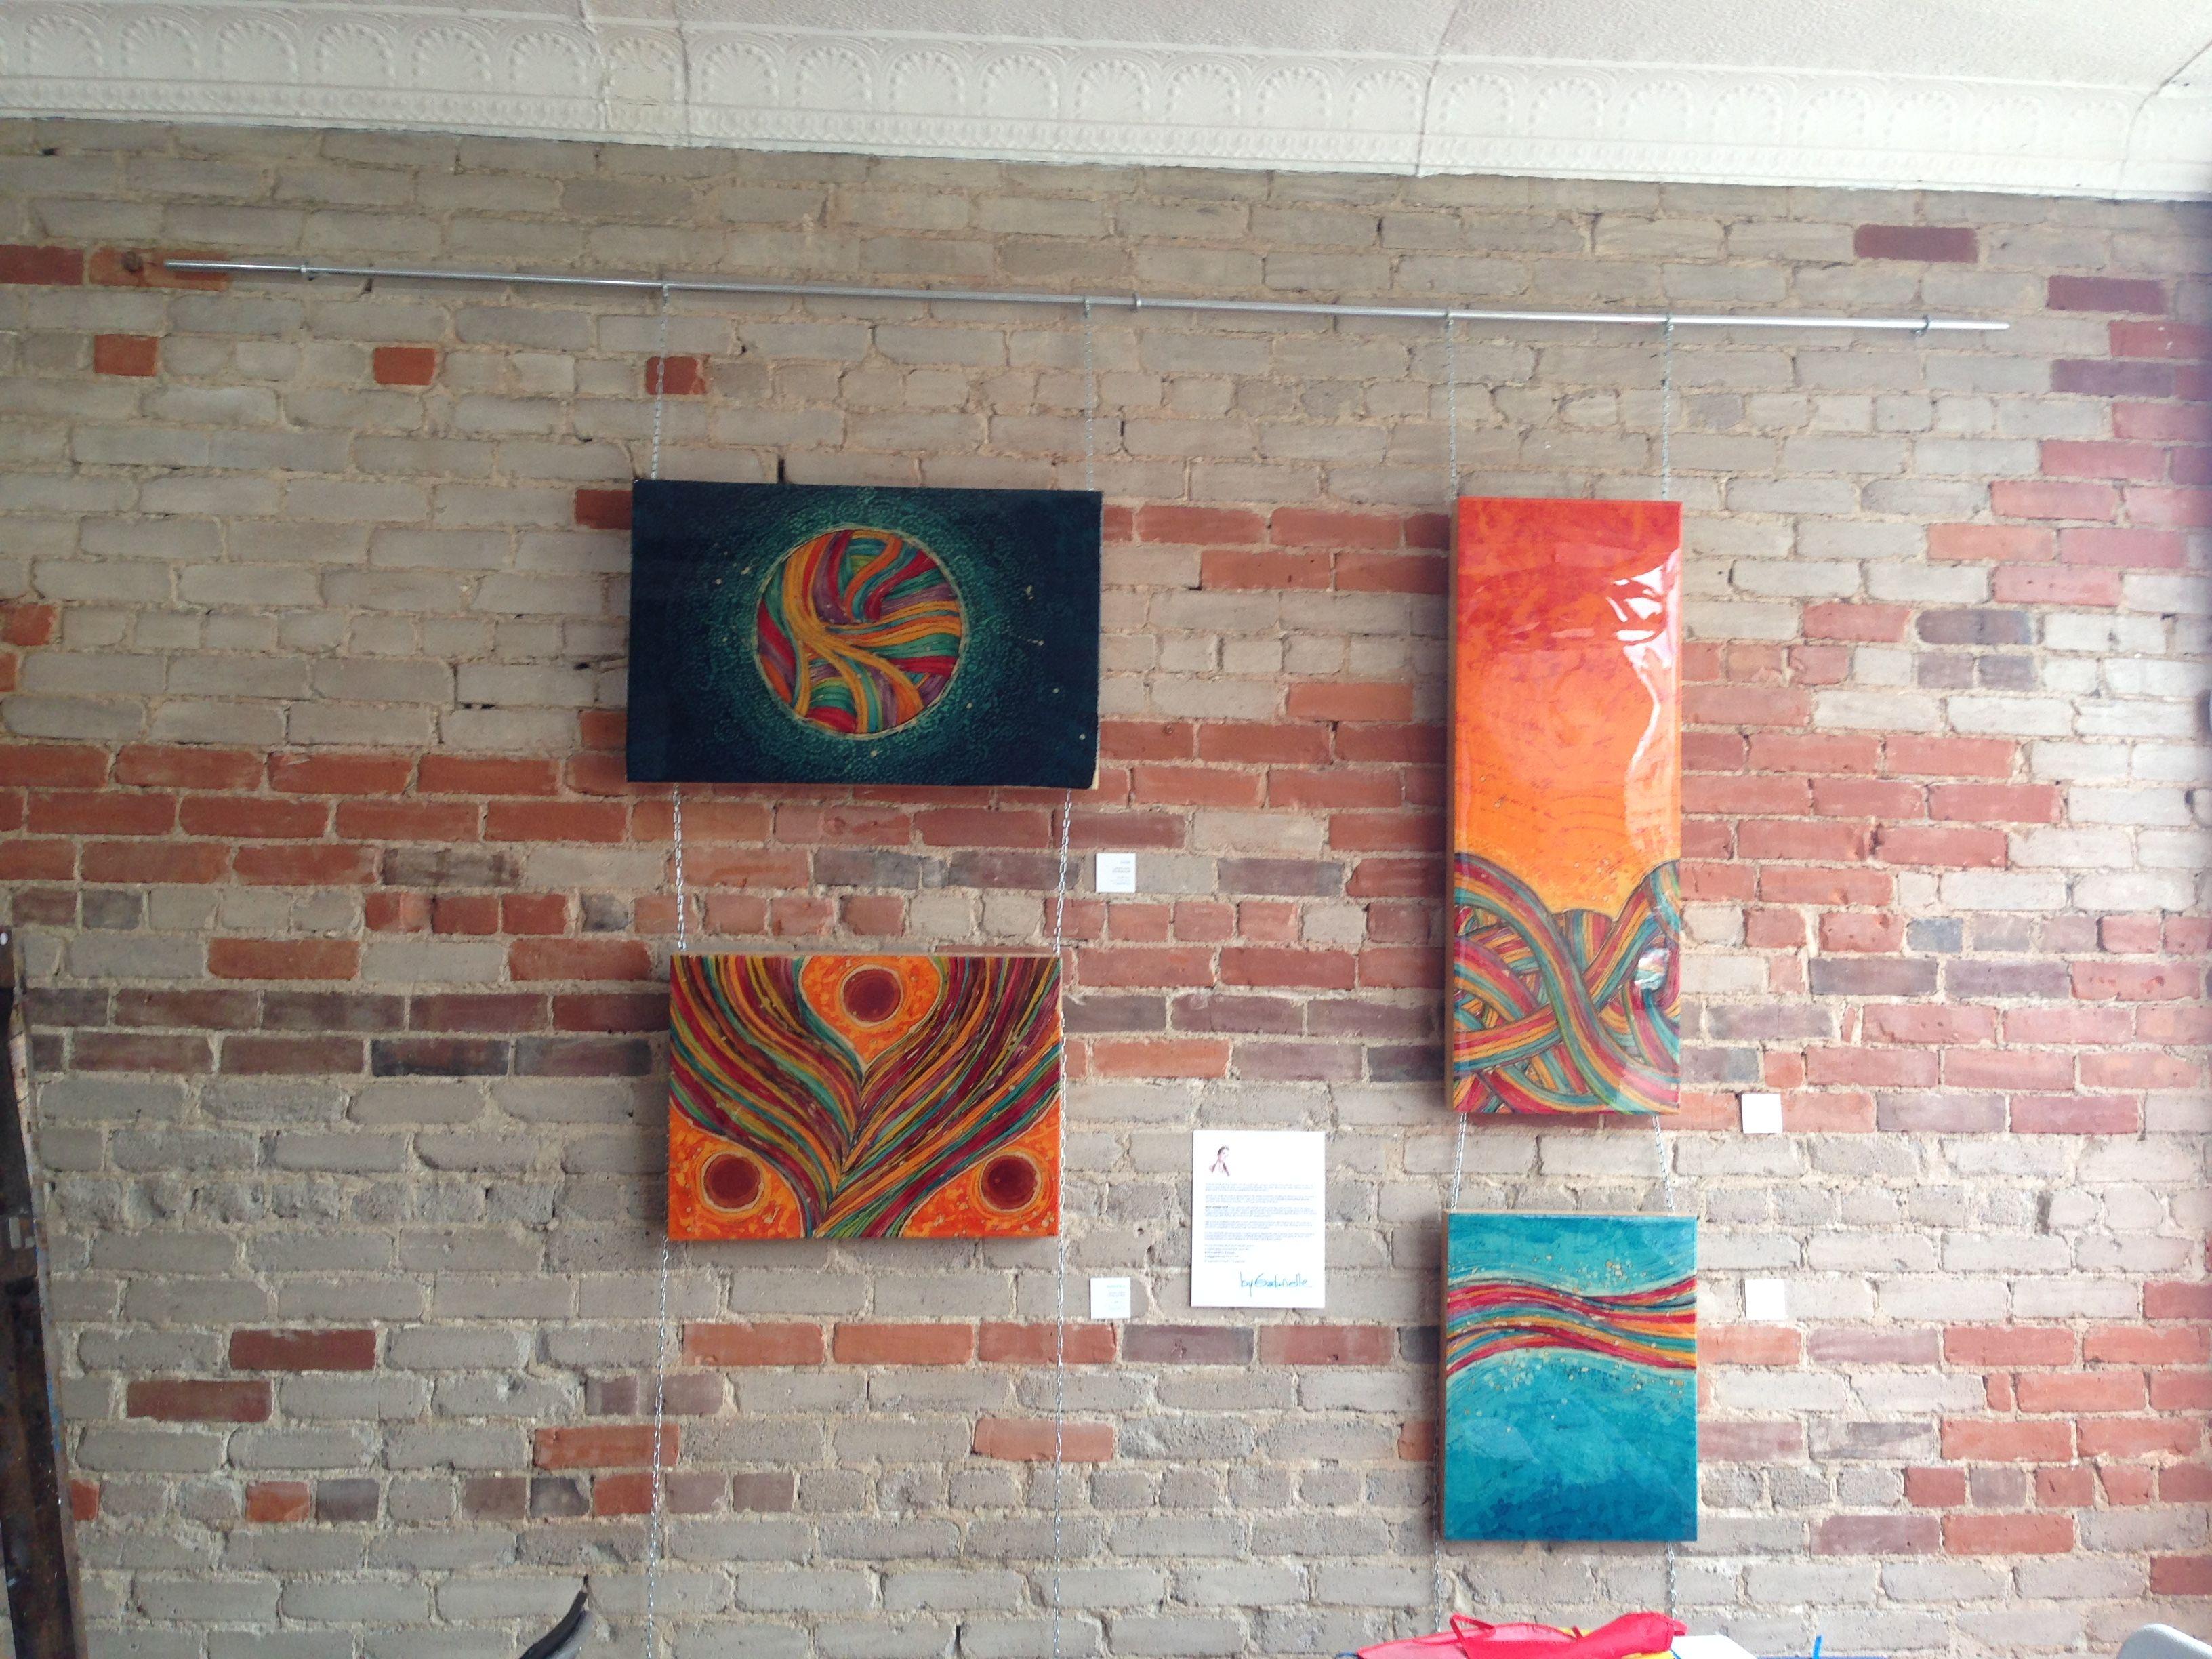 Art studio rentals for toronto artists looking for an